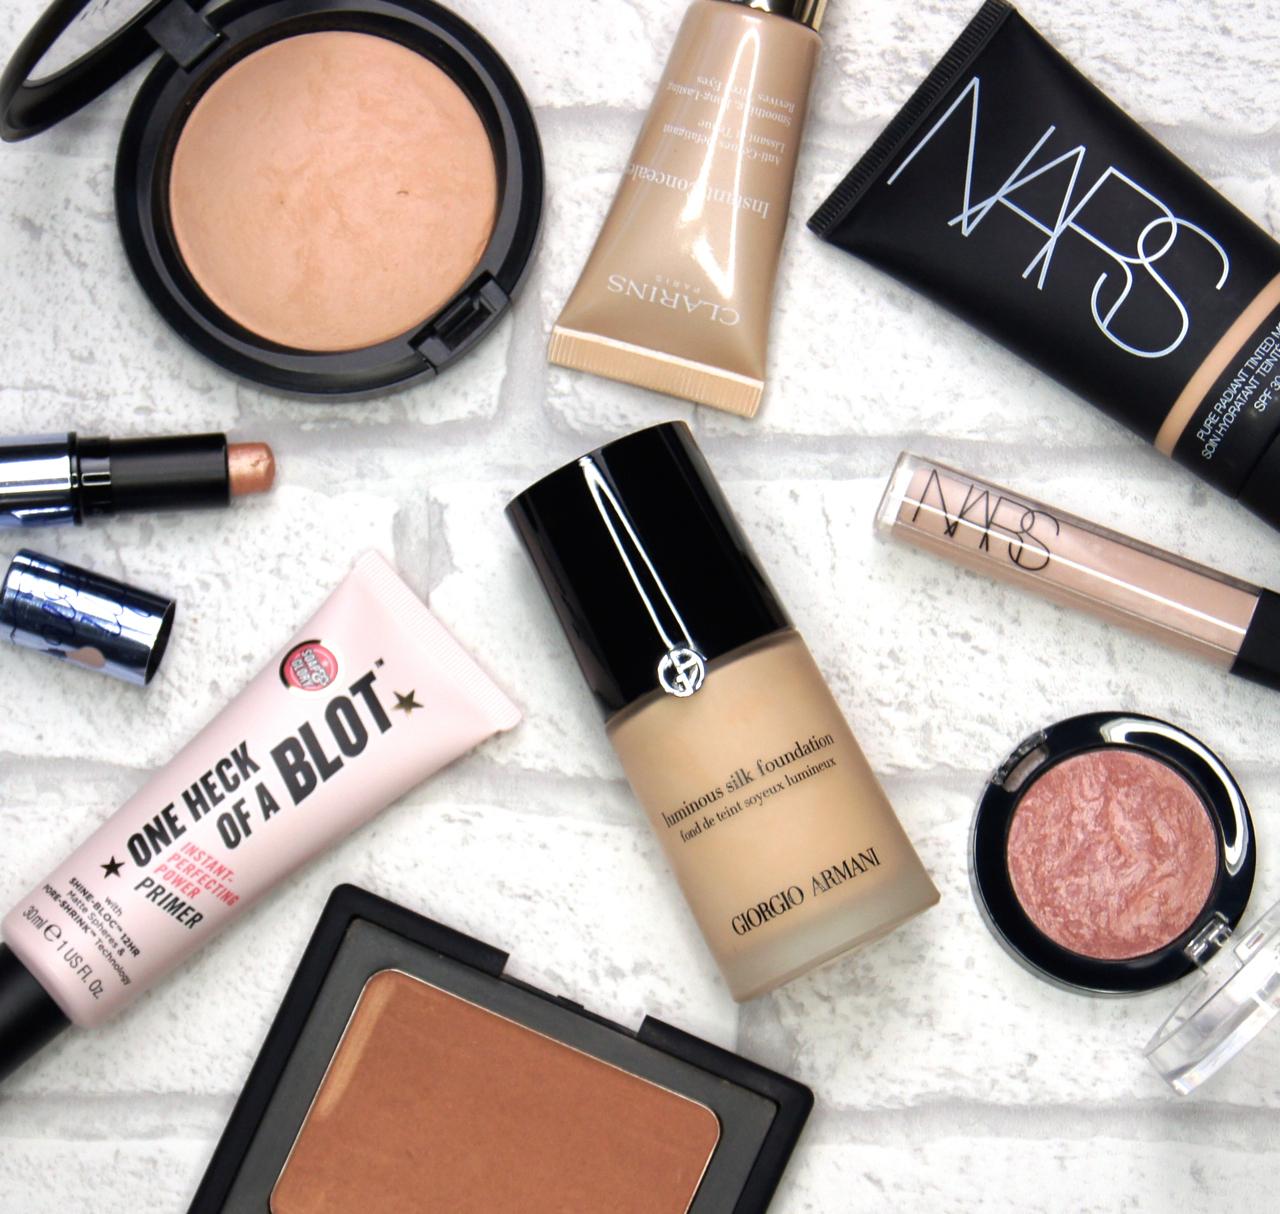 best makeup products 2015 primer tinted moisturiser foundation concealer powder bronzer highlighter blush